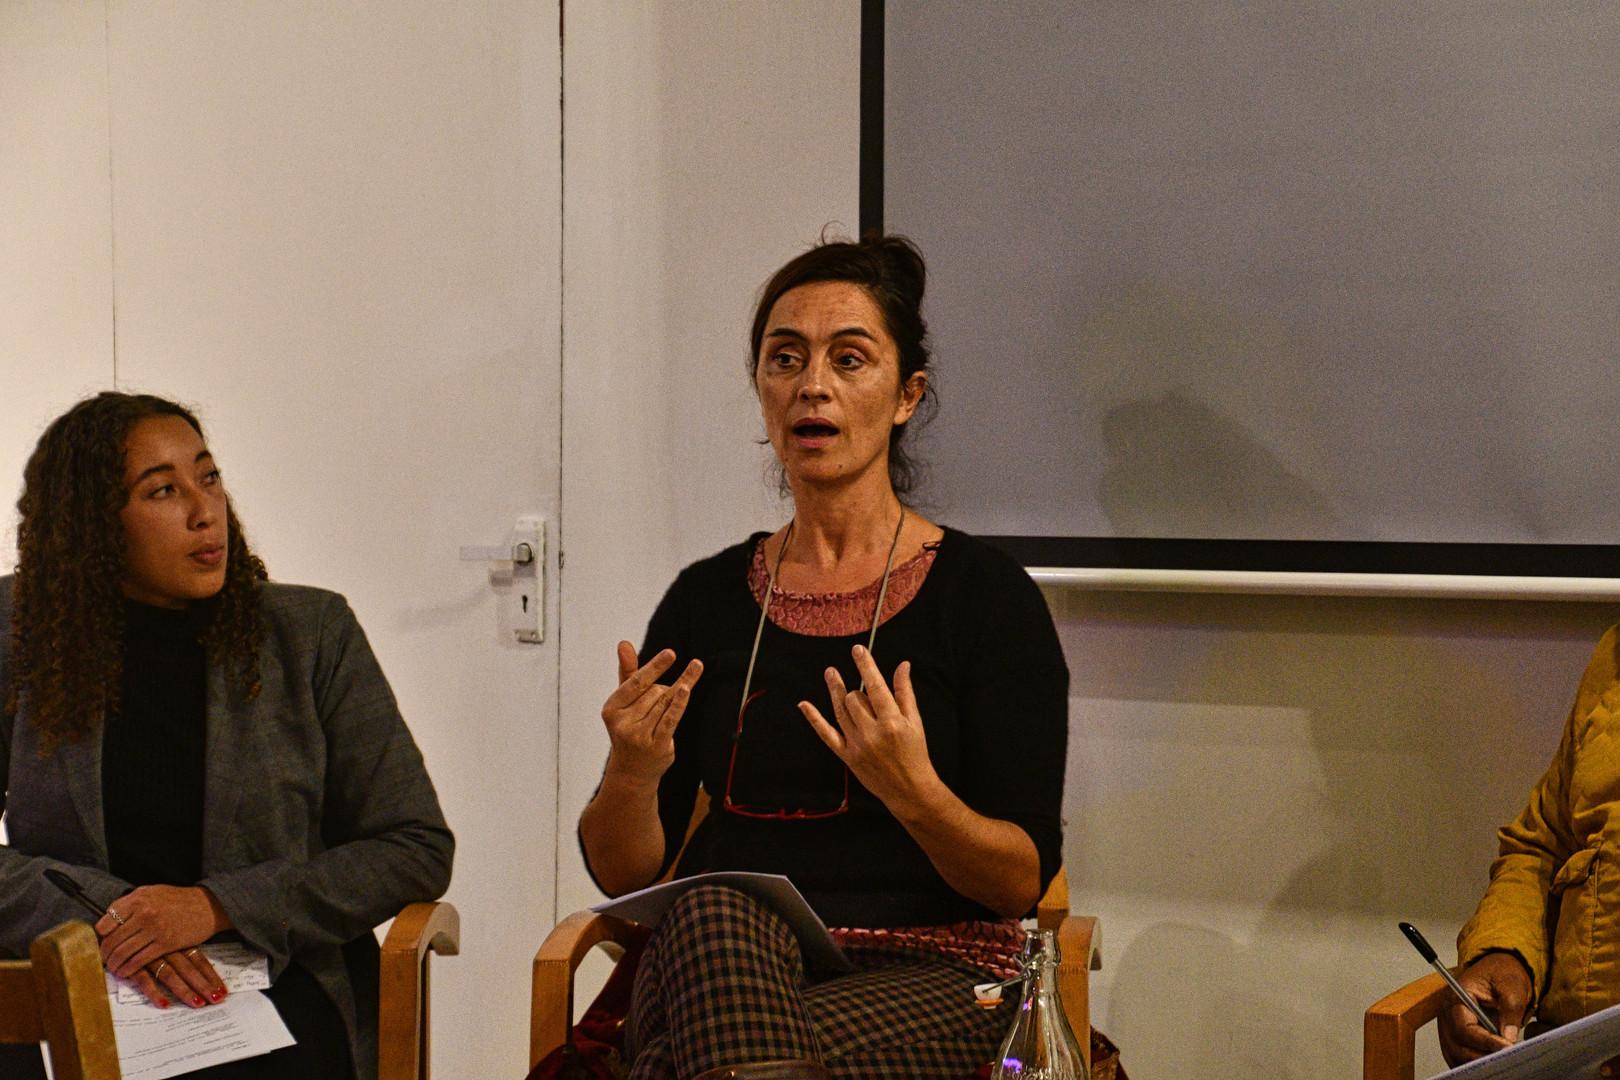 Abi Hutchinson and Misri Dey